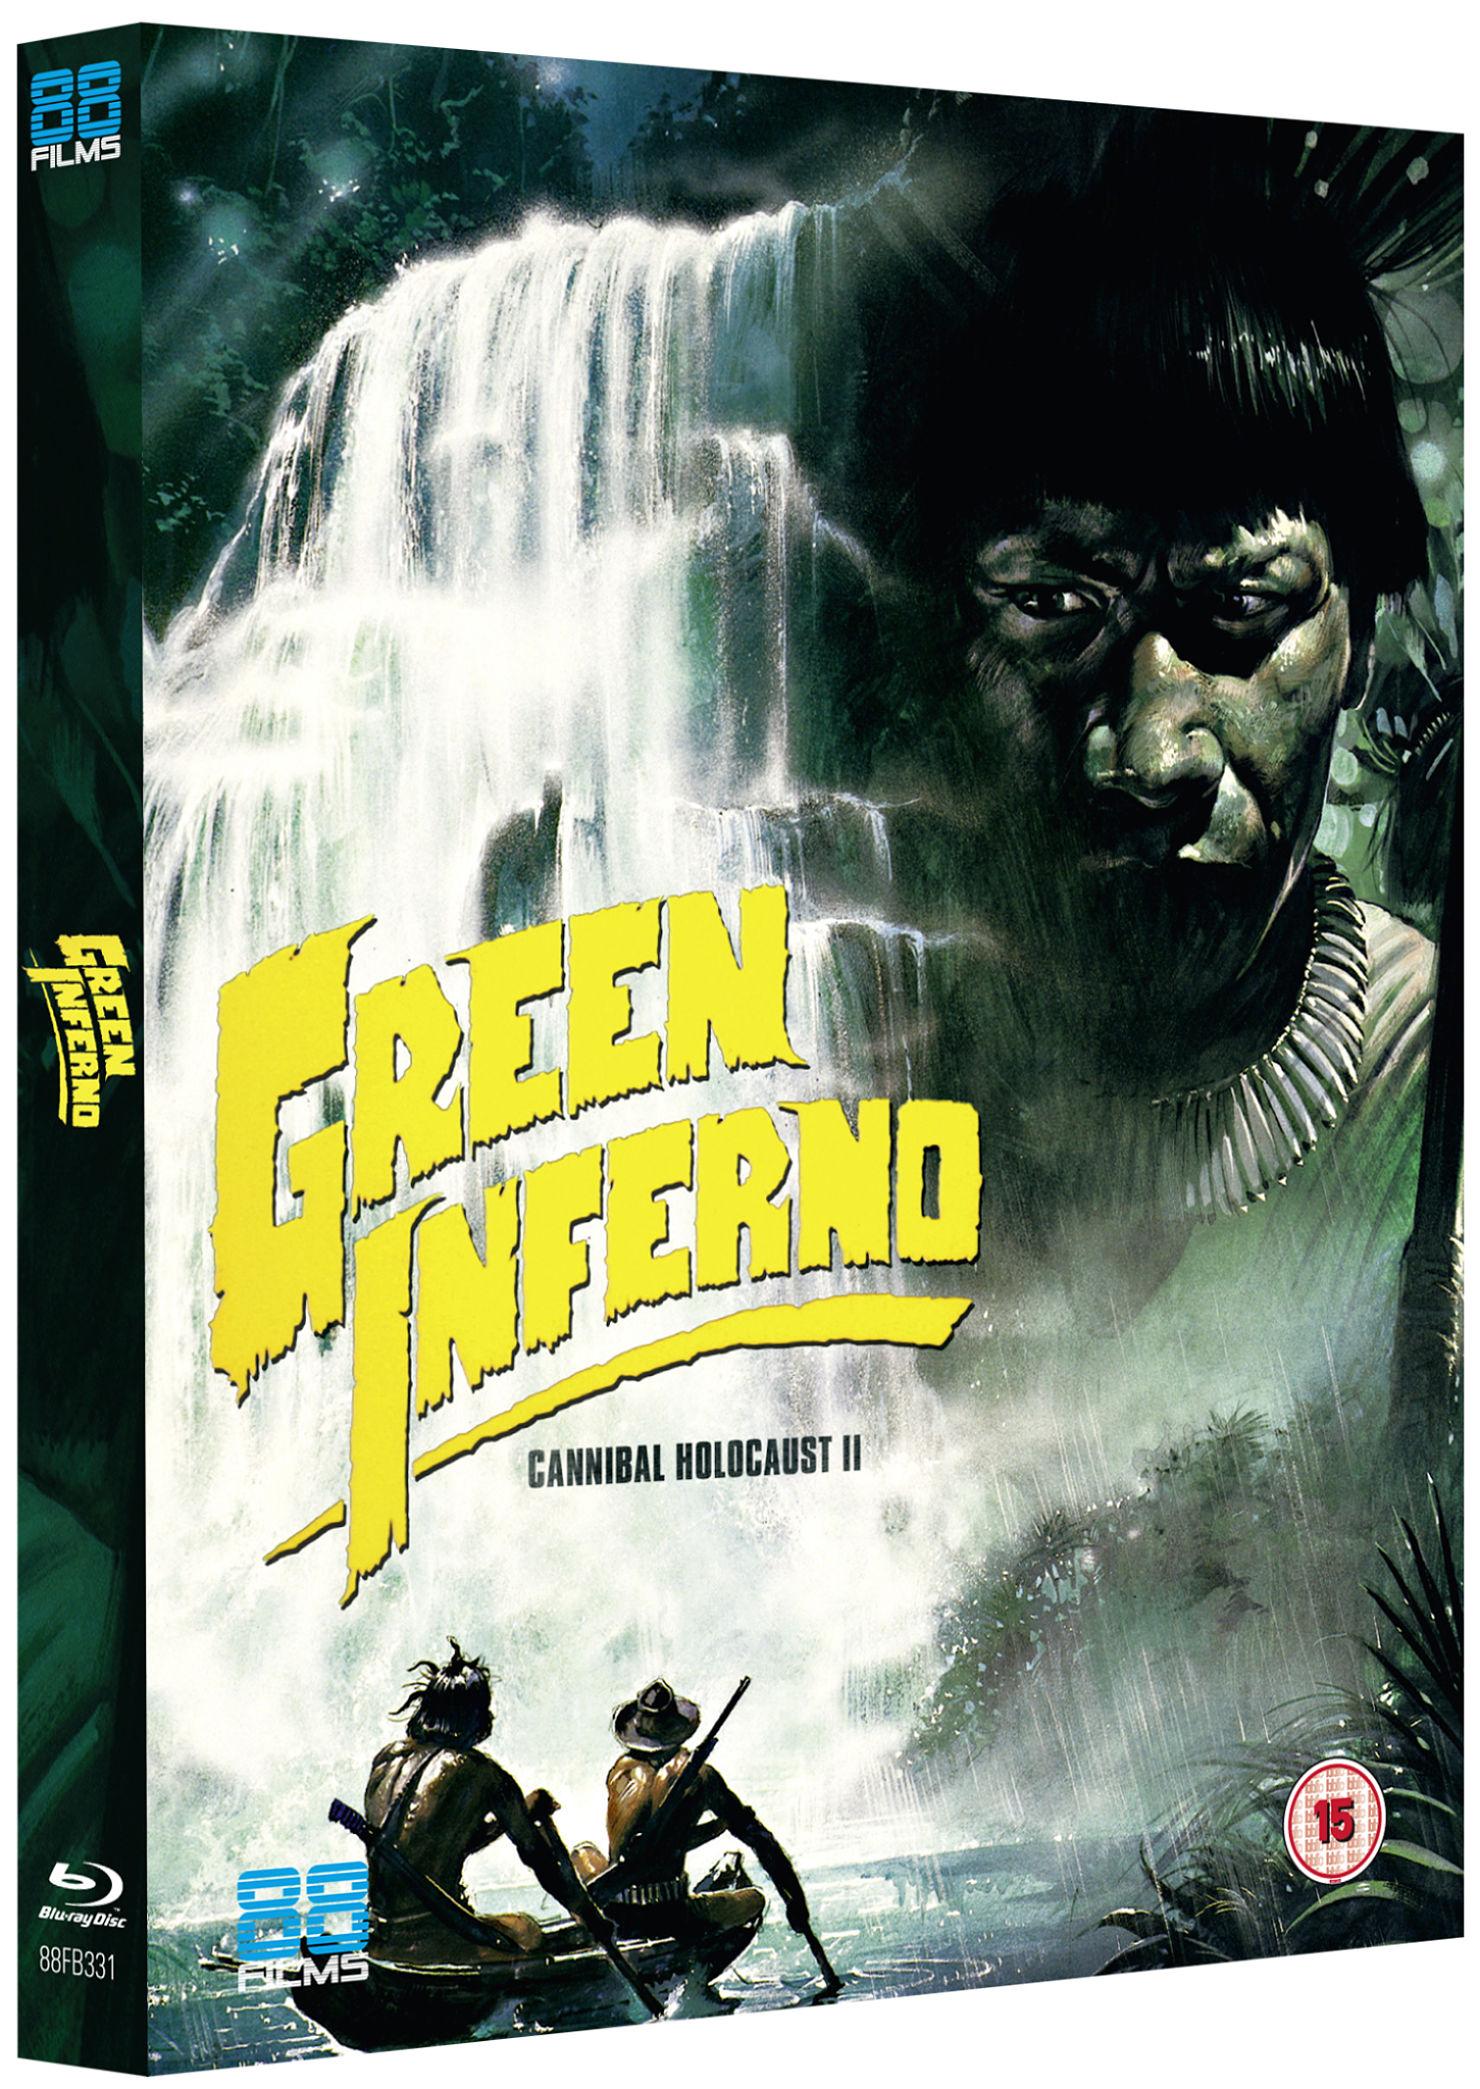 The Green Inferno - Cannibal Holocaust 2 3D Packshot Slipcase.jpg